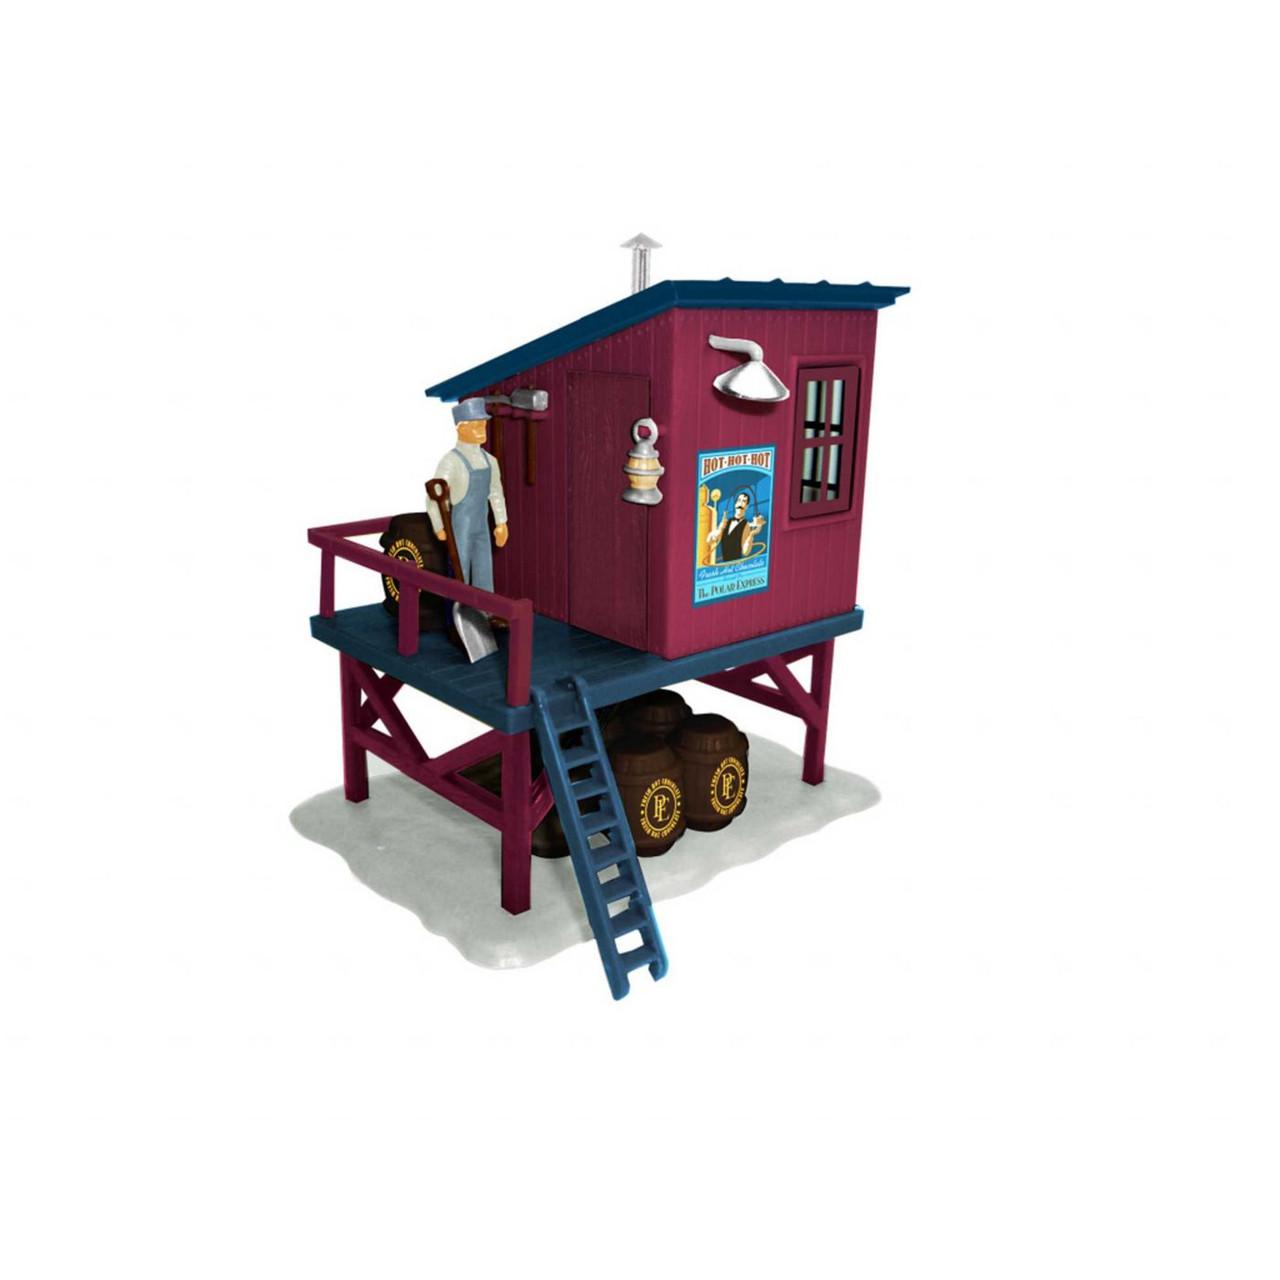 Lionel 2030150 - The Polar Express Barrel Shed